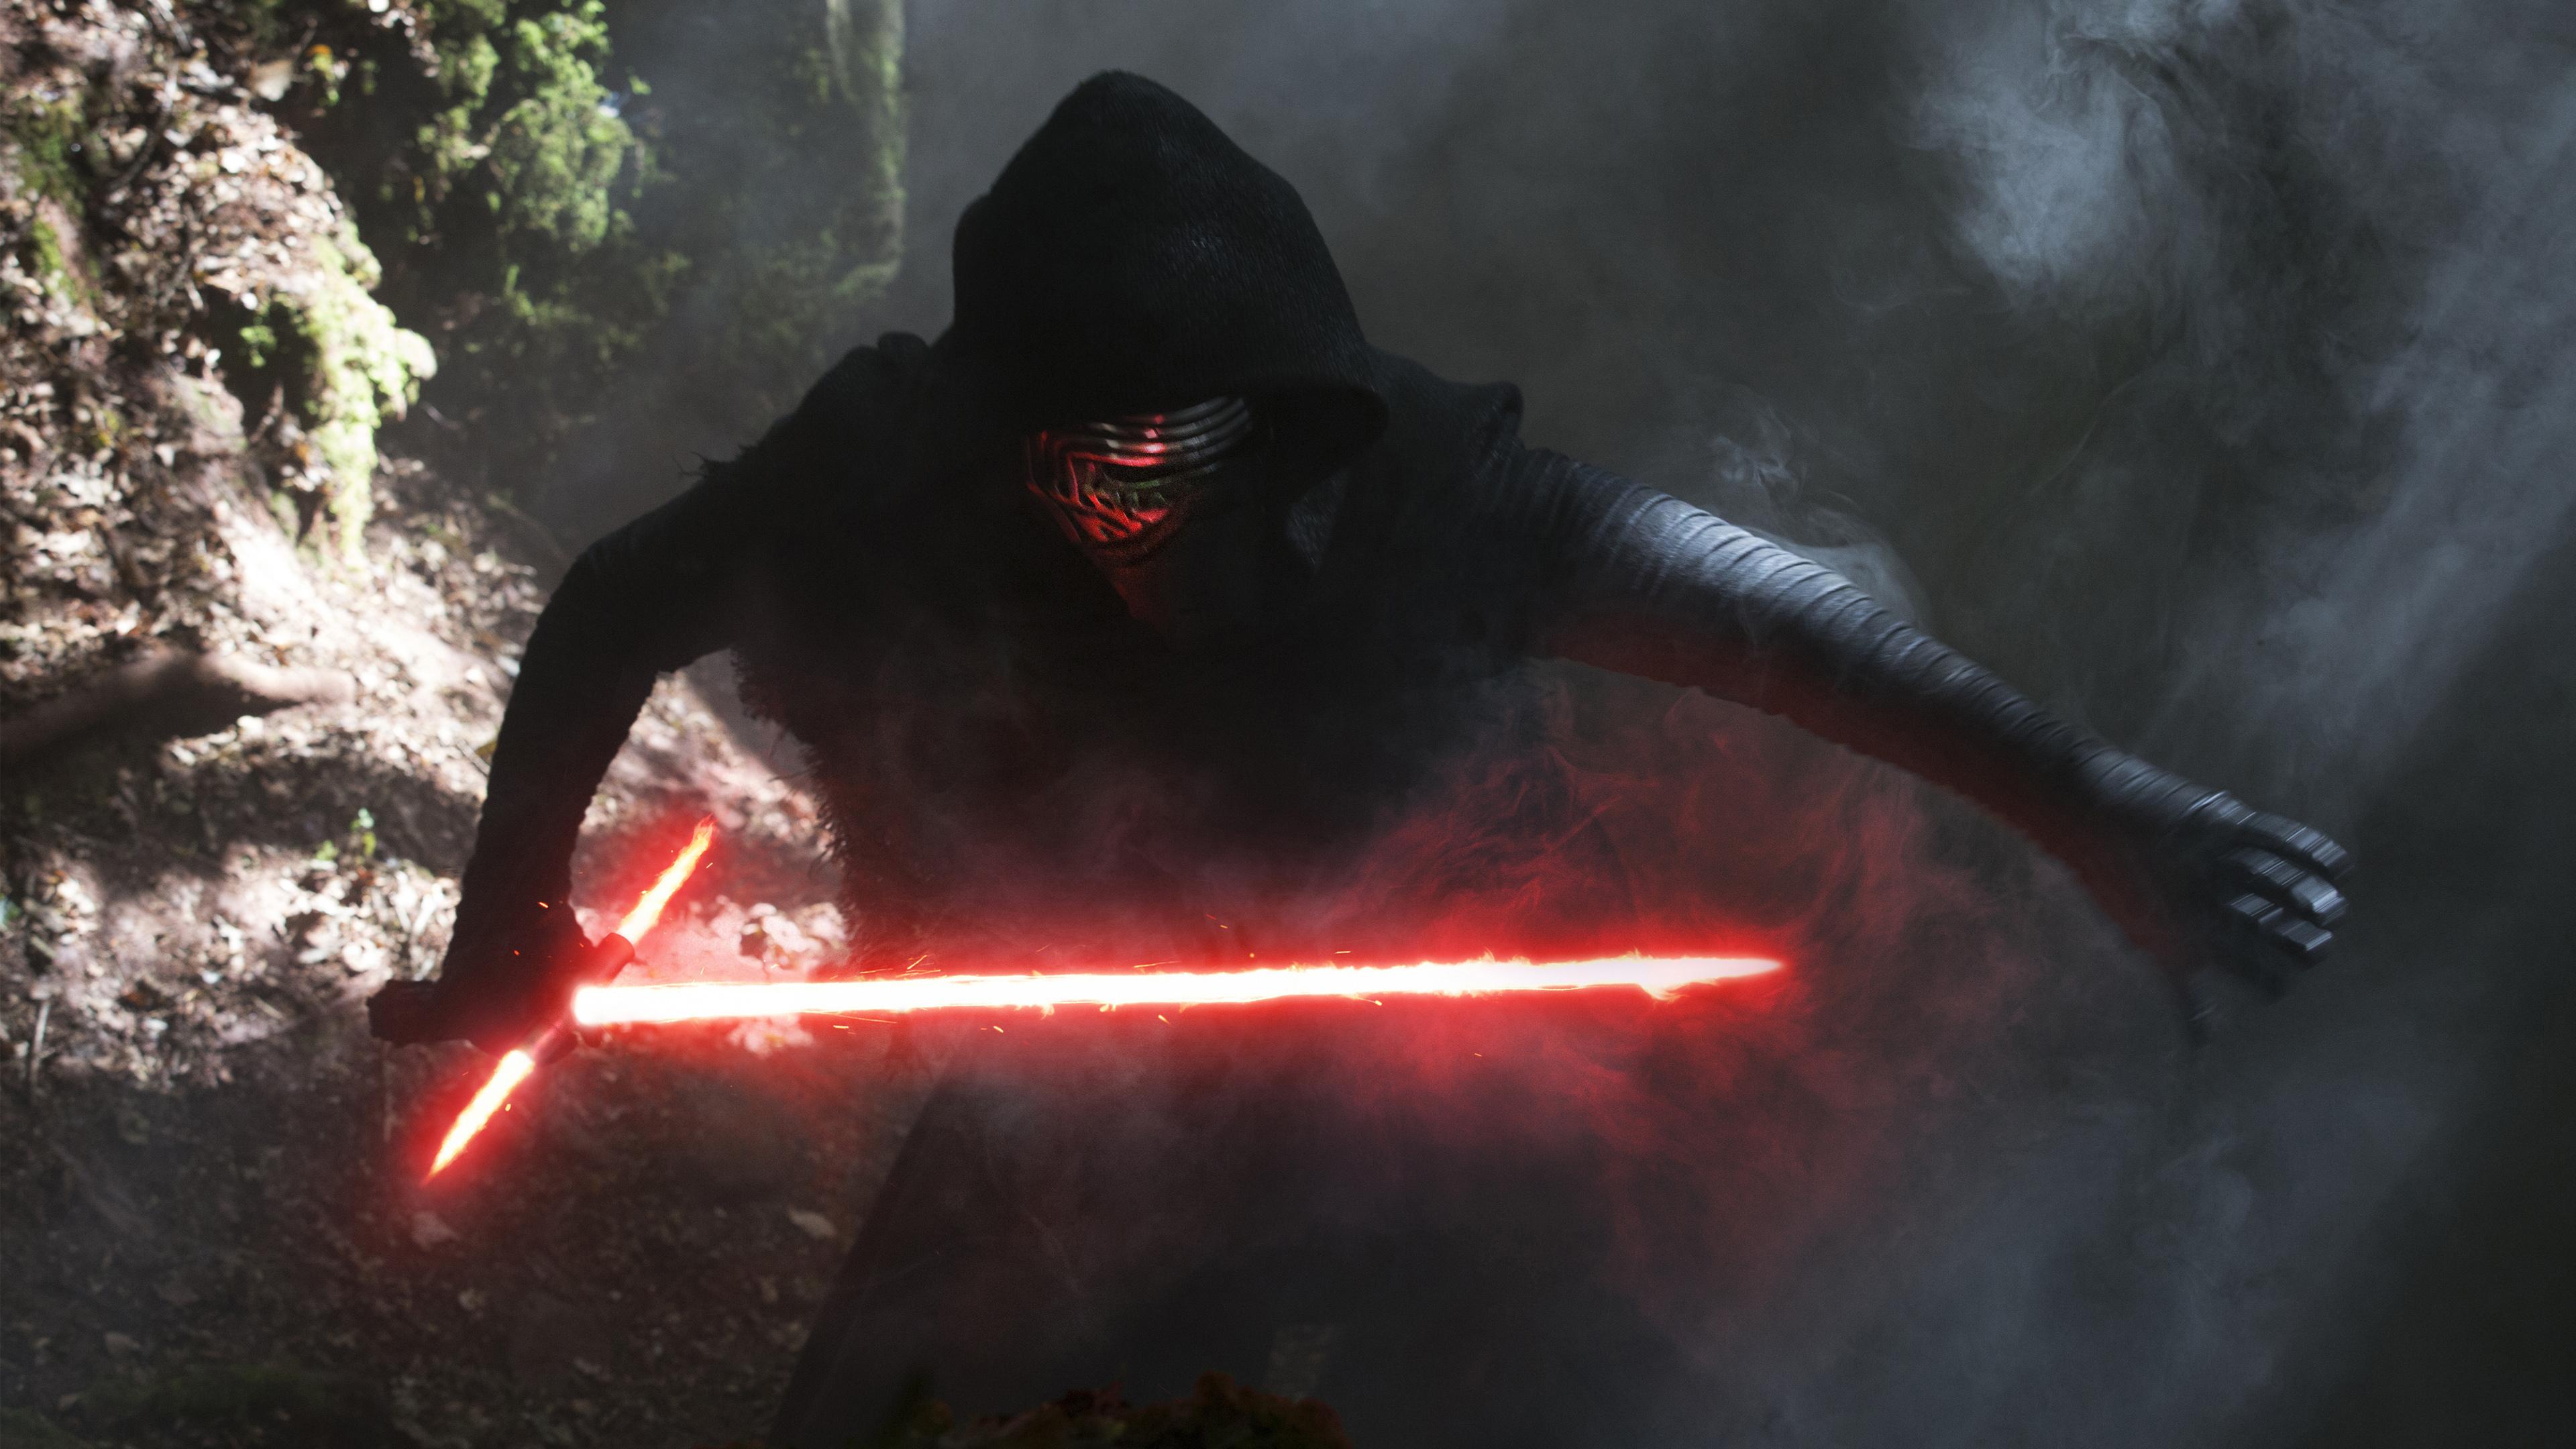 Kylo Ren Star Wars The Force Awakens Wallpapers HD Wallpapers 3840x2160